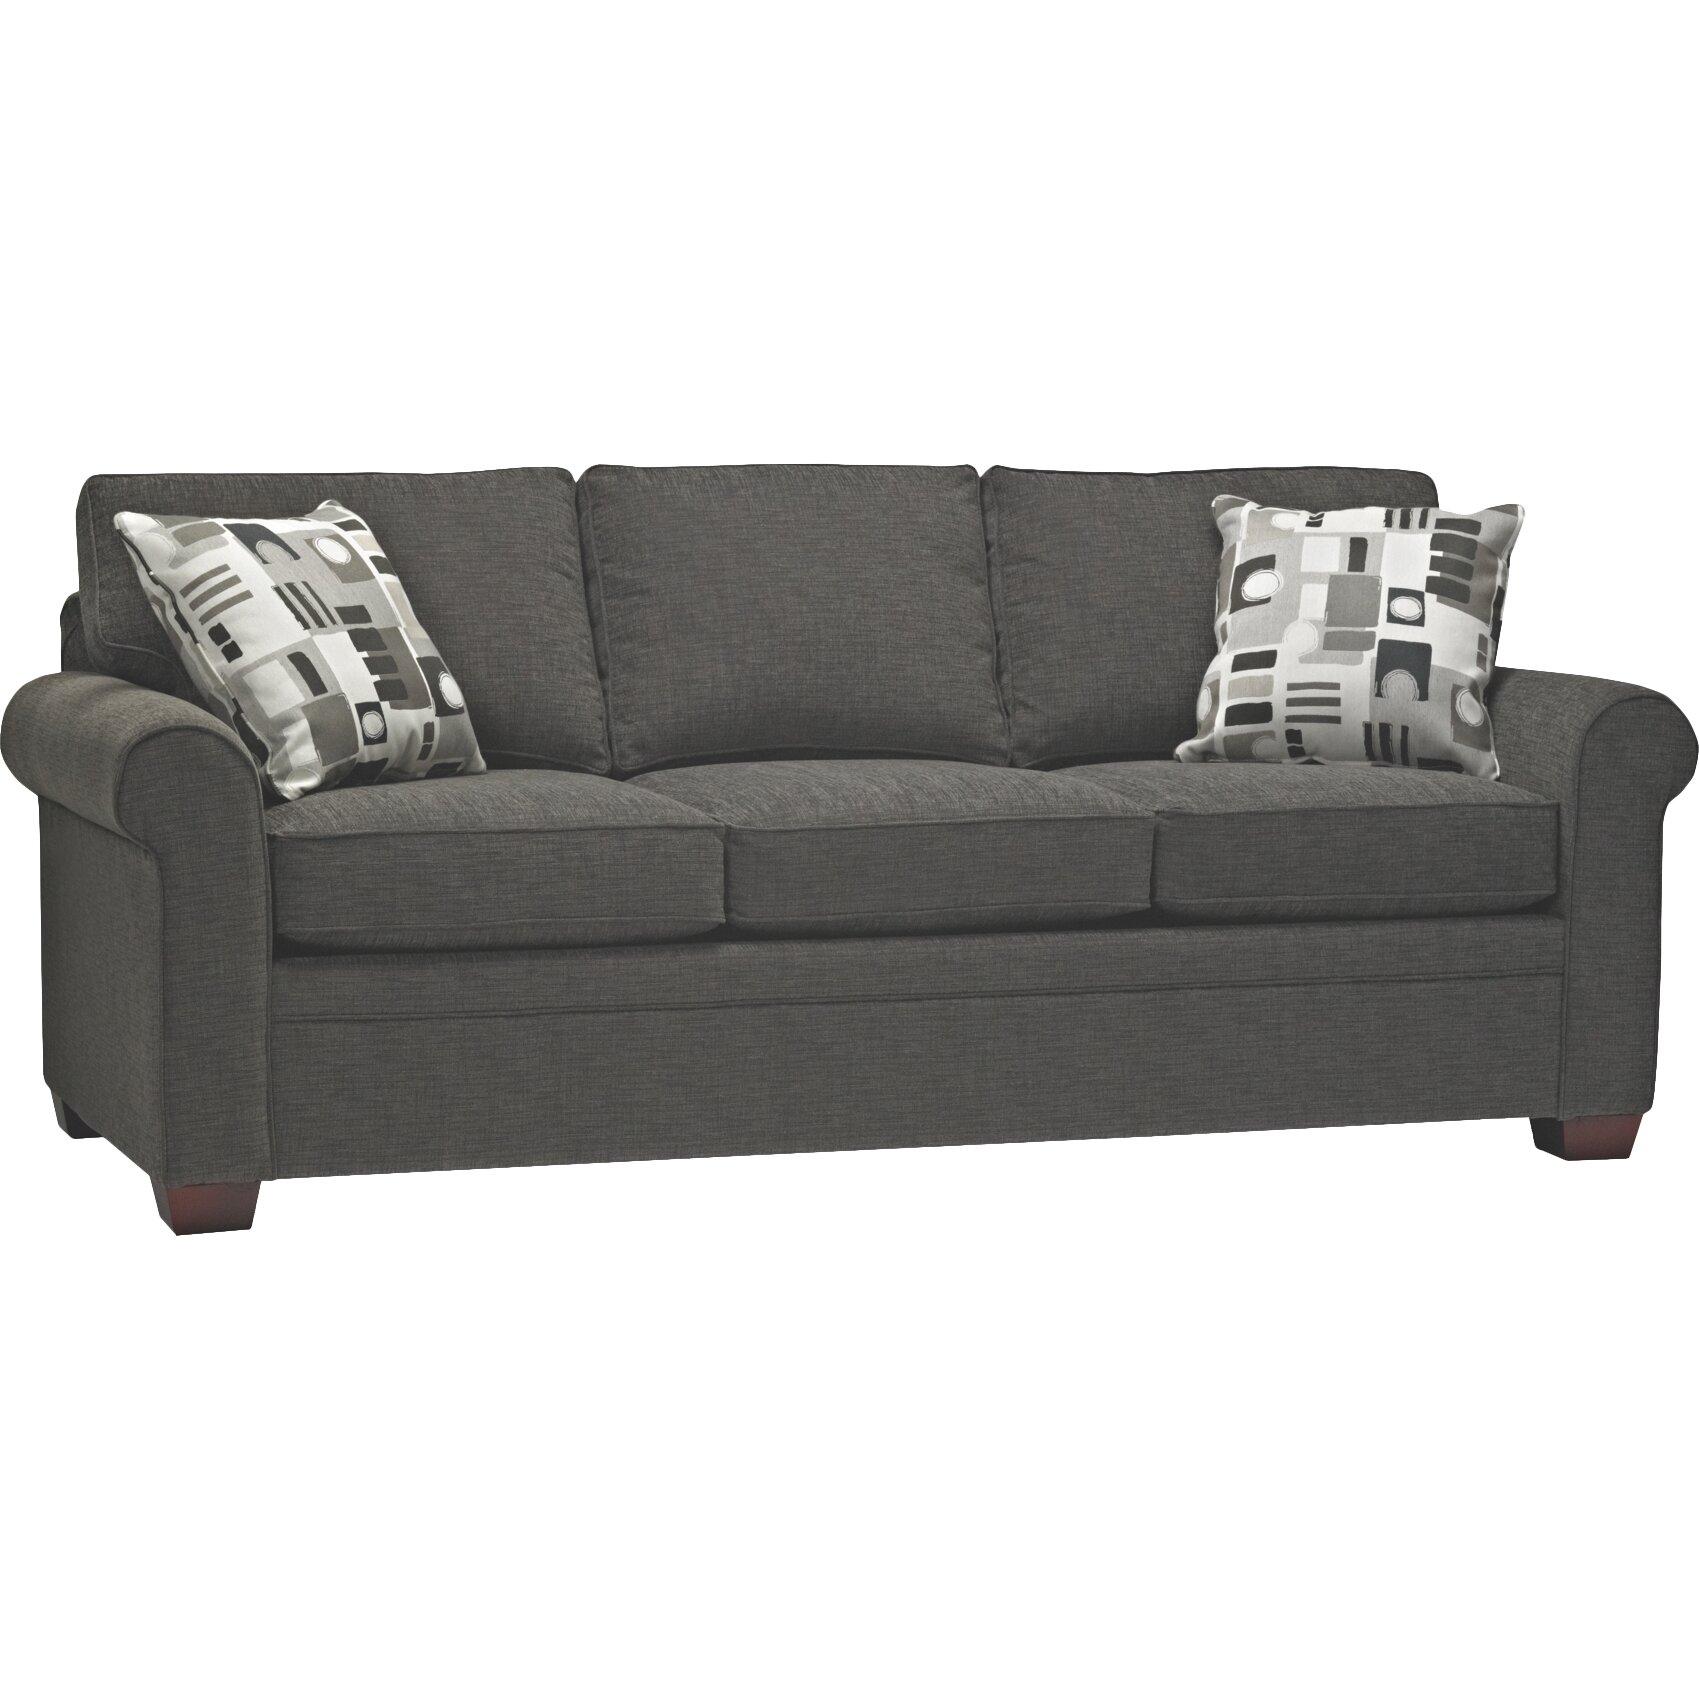 sofas to go tom double sleeper sofa wayfair. Black Bedroom Furniture Sets. Home Design Ideas